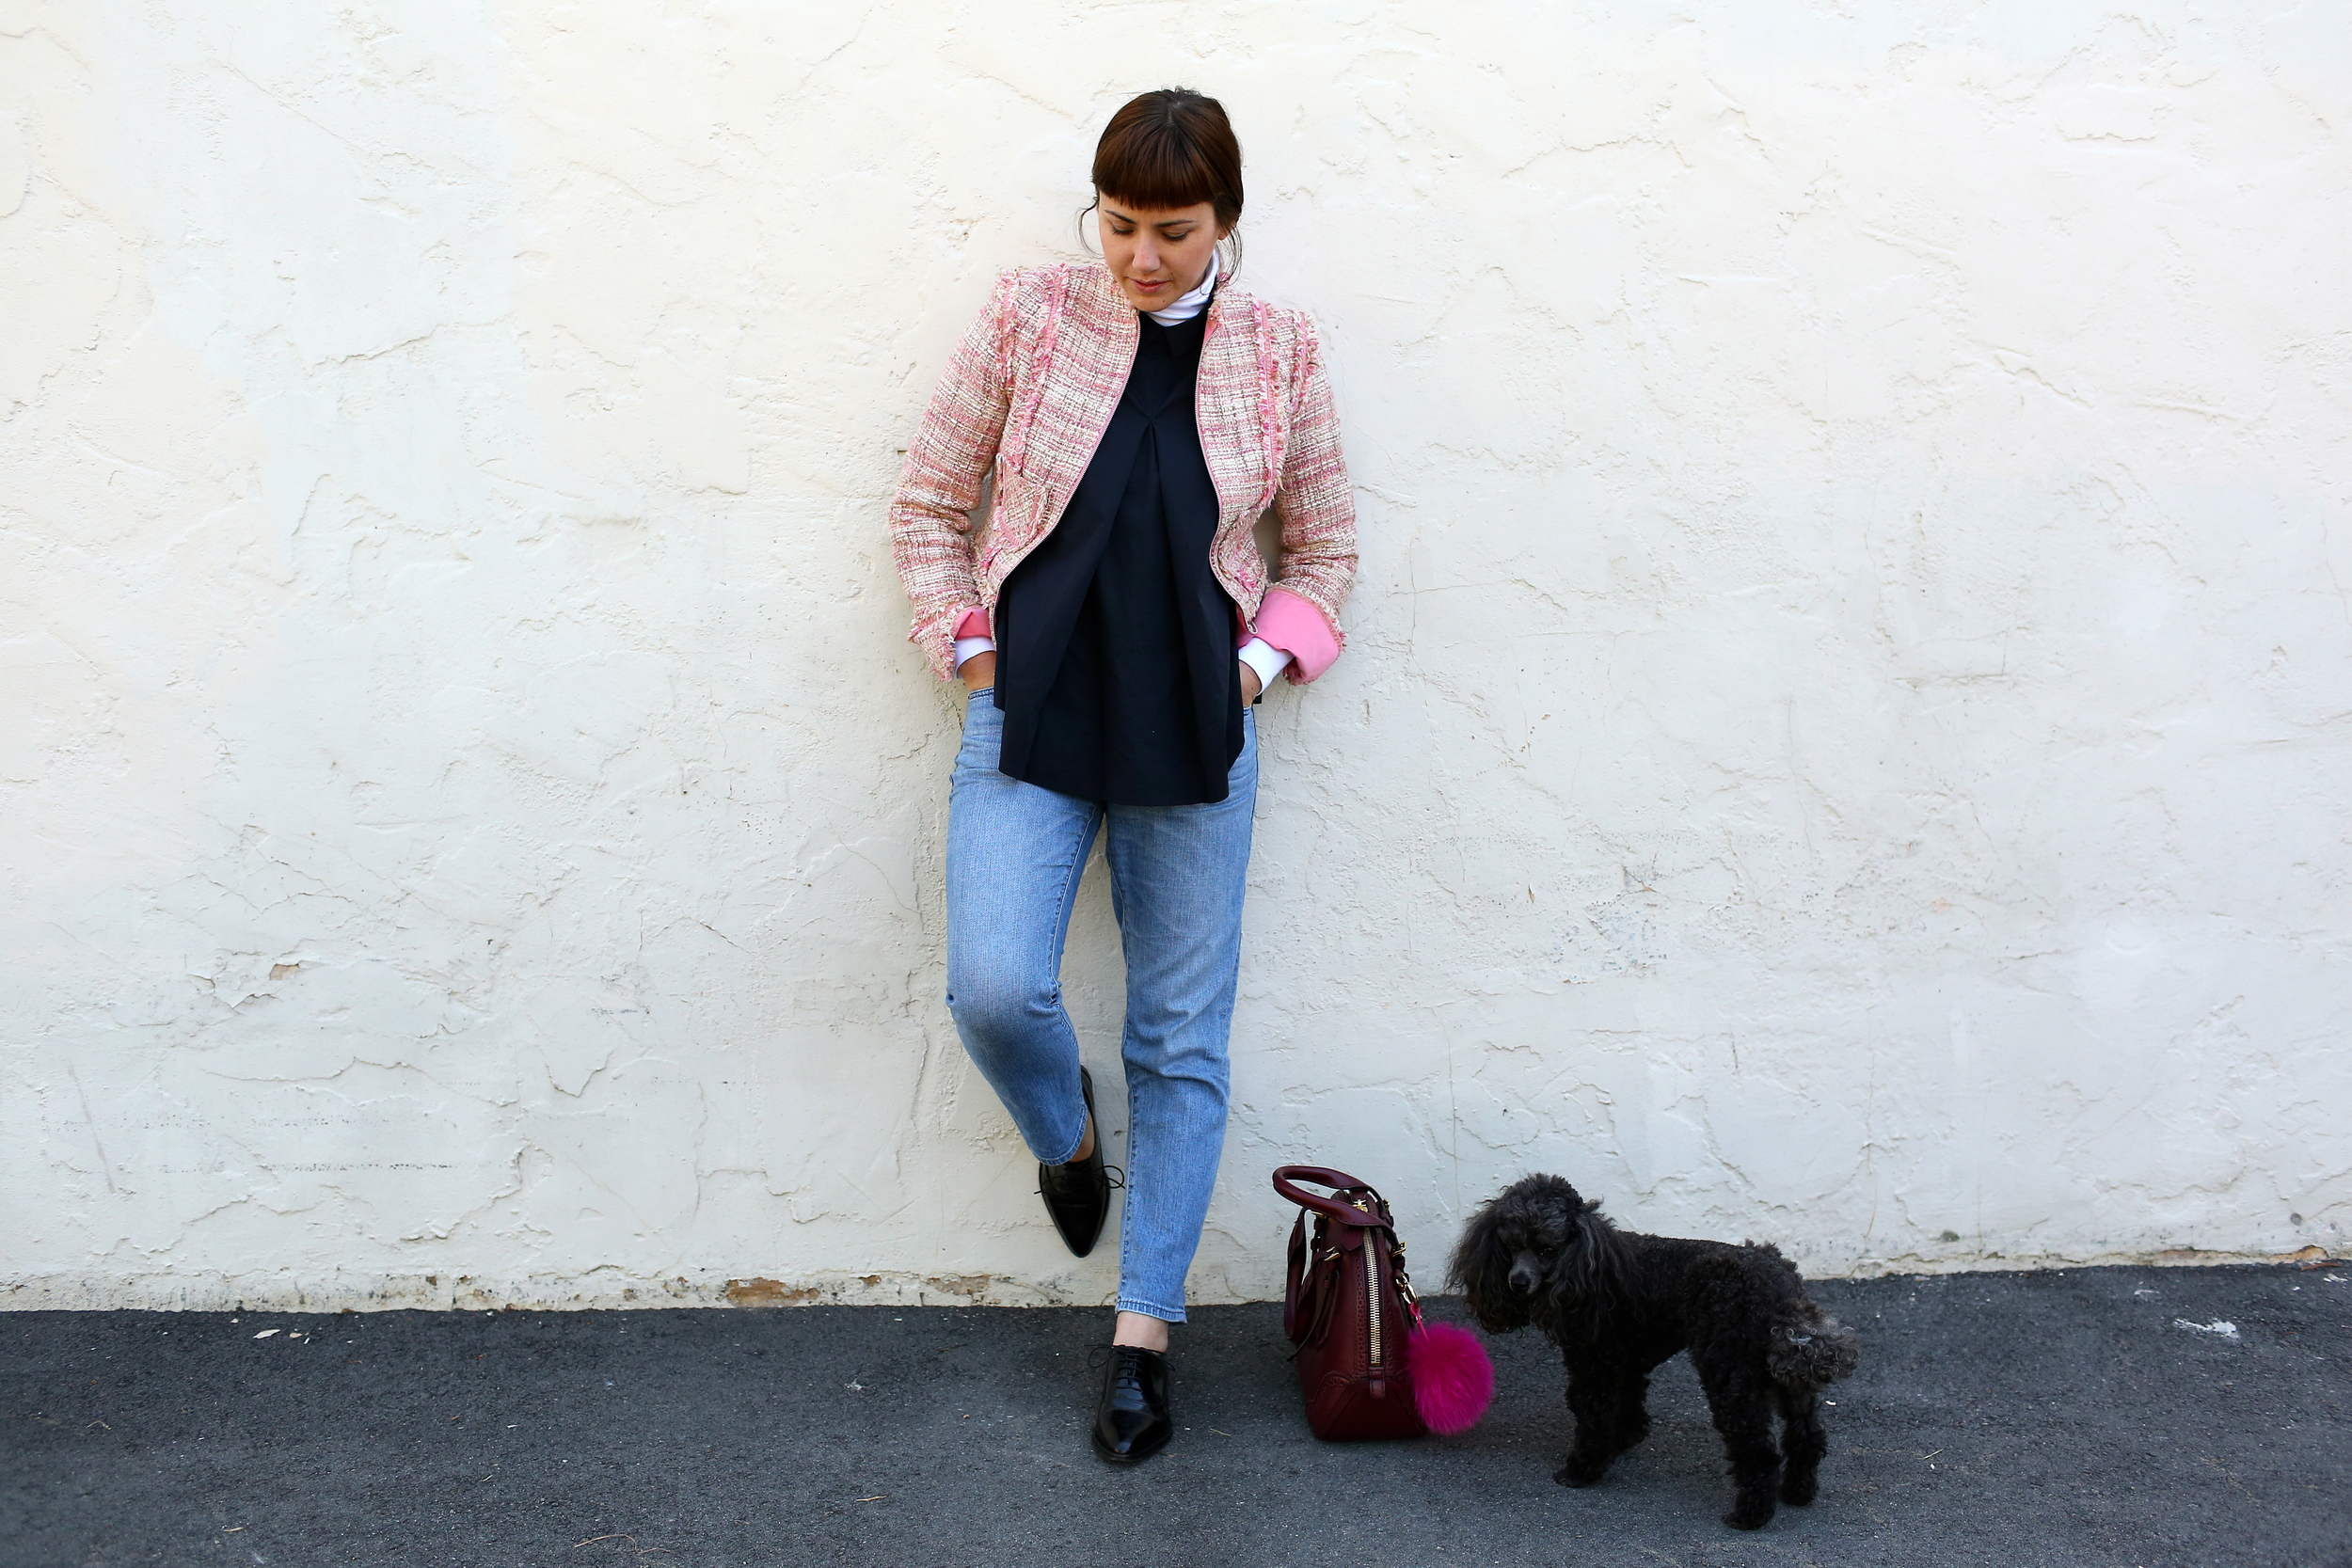 Jacket: Charles Chang Lima, vintage; Turtleneck: Gap; Blouse: COS; Boyfriend Jeans: Uniqlo; Oxfords: Jonak